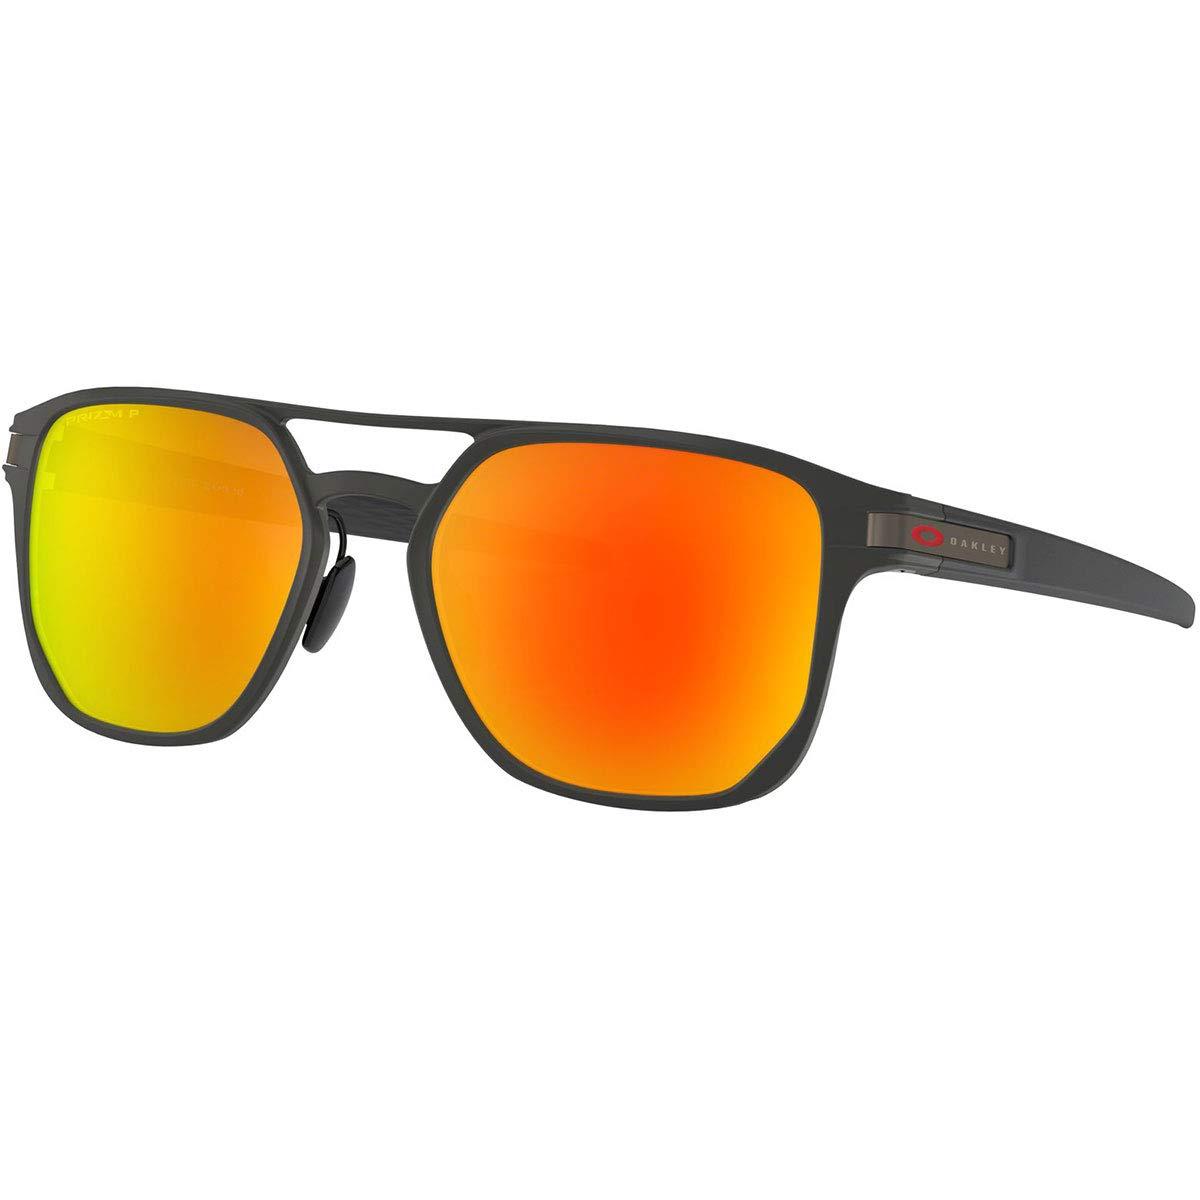 0ca38b723acd Amazon.com: Oakley Men's Latch Alpha Sunglasses,One Size,Matte Black/Red:  Clothing